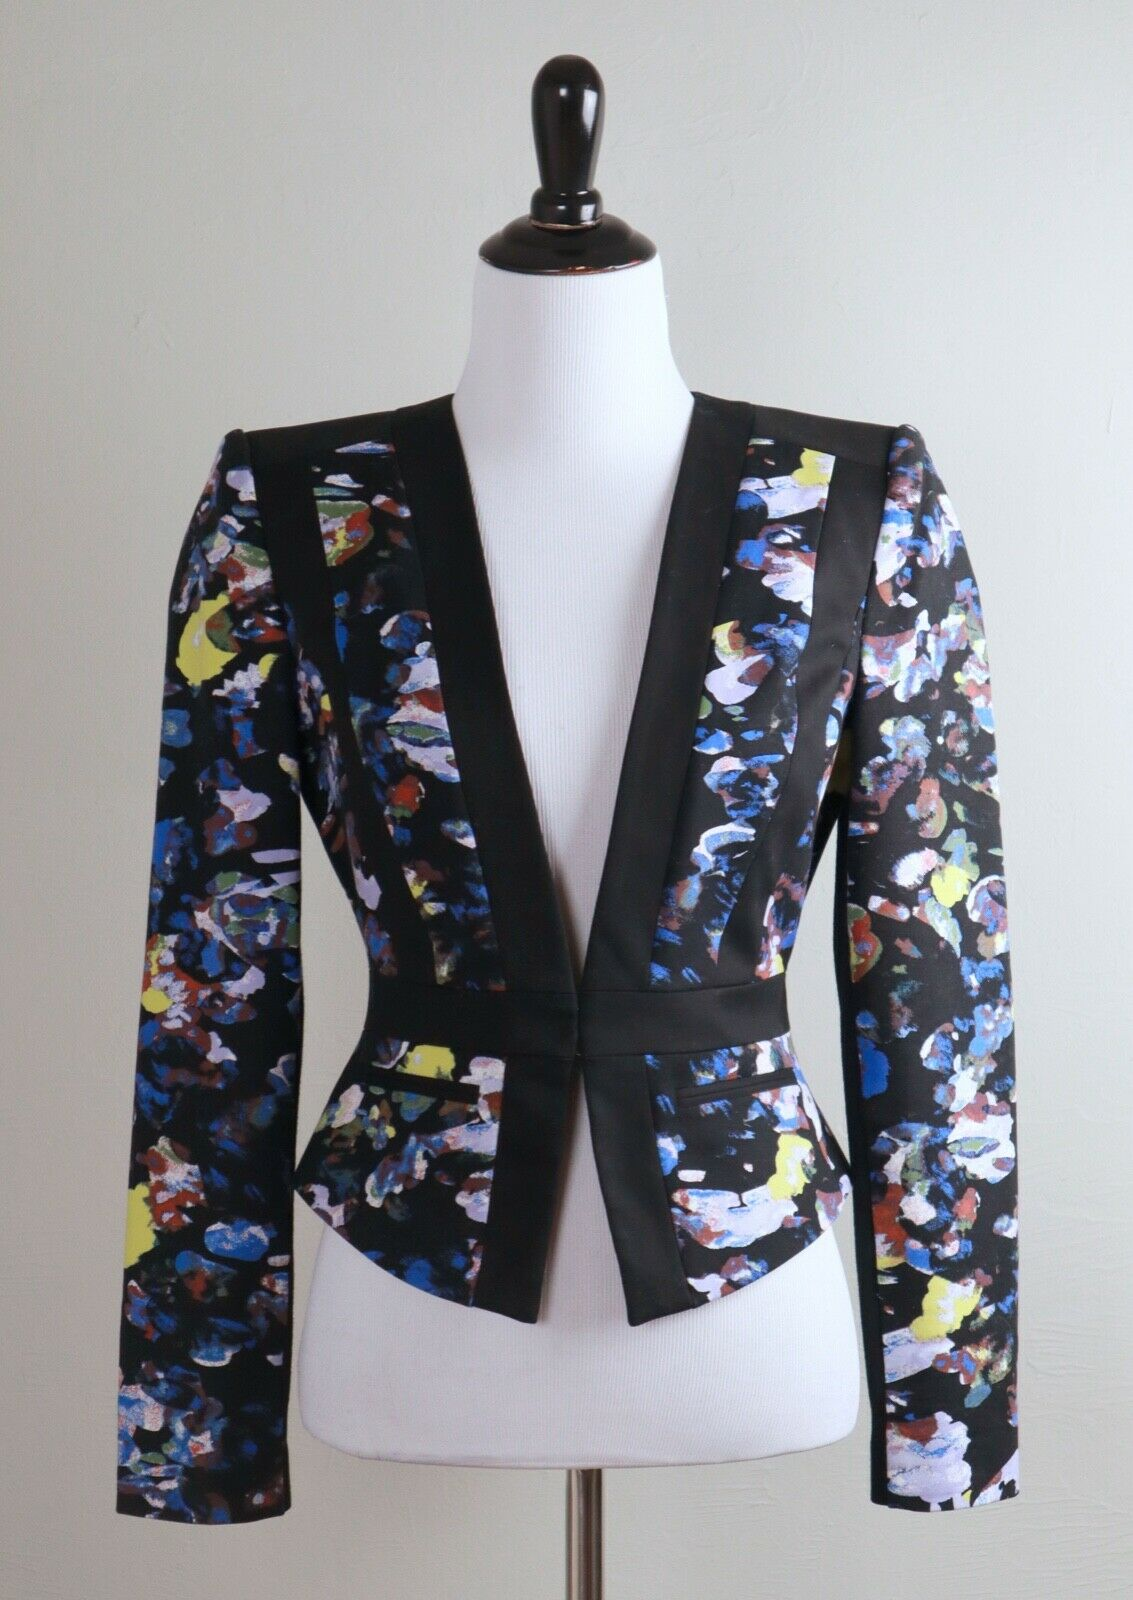 BCBG MAX AZRIA Keeley Structured Print Blocked Jacket Top Size XXS / 2XS